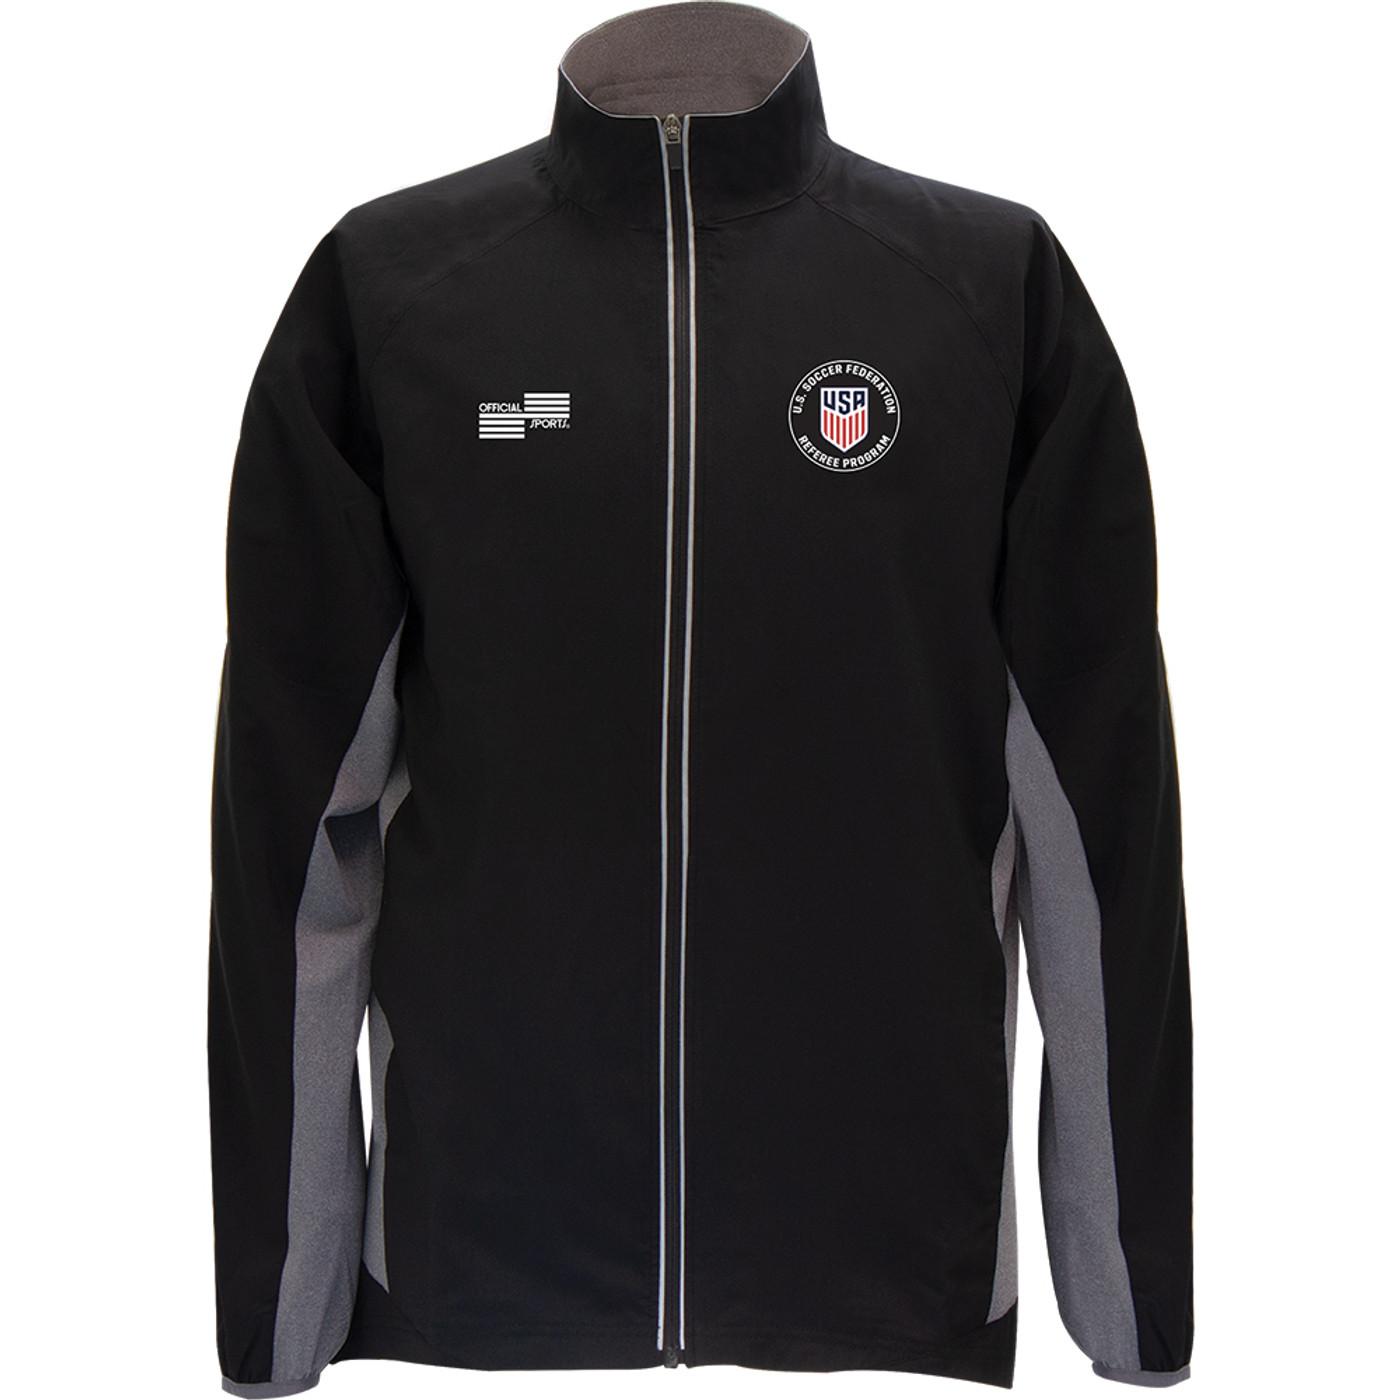 1199JCL USSF Full Zip Training Jacket